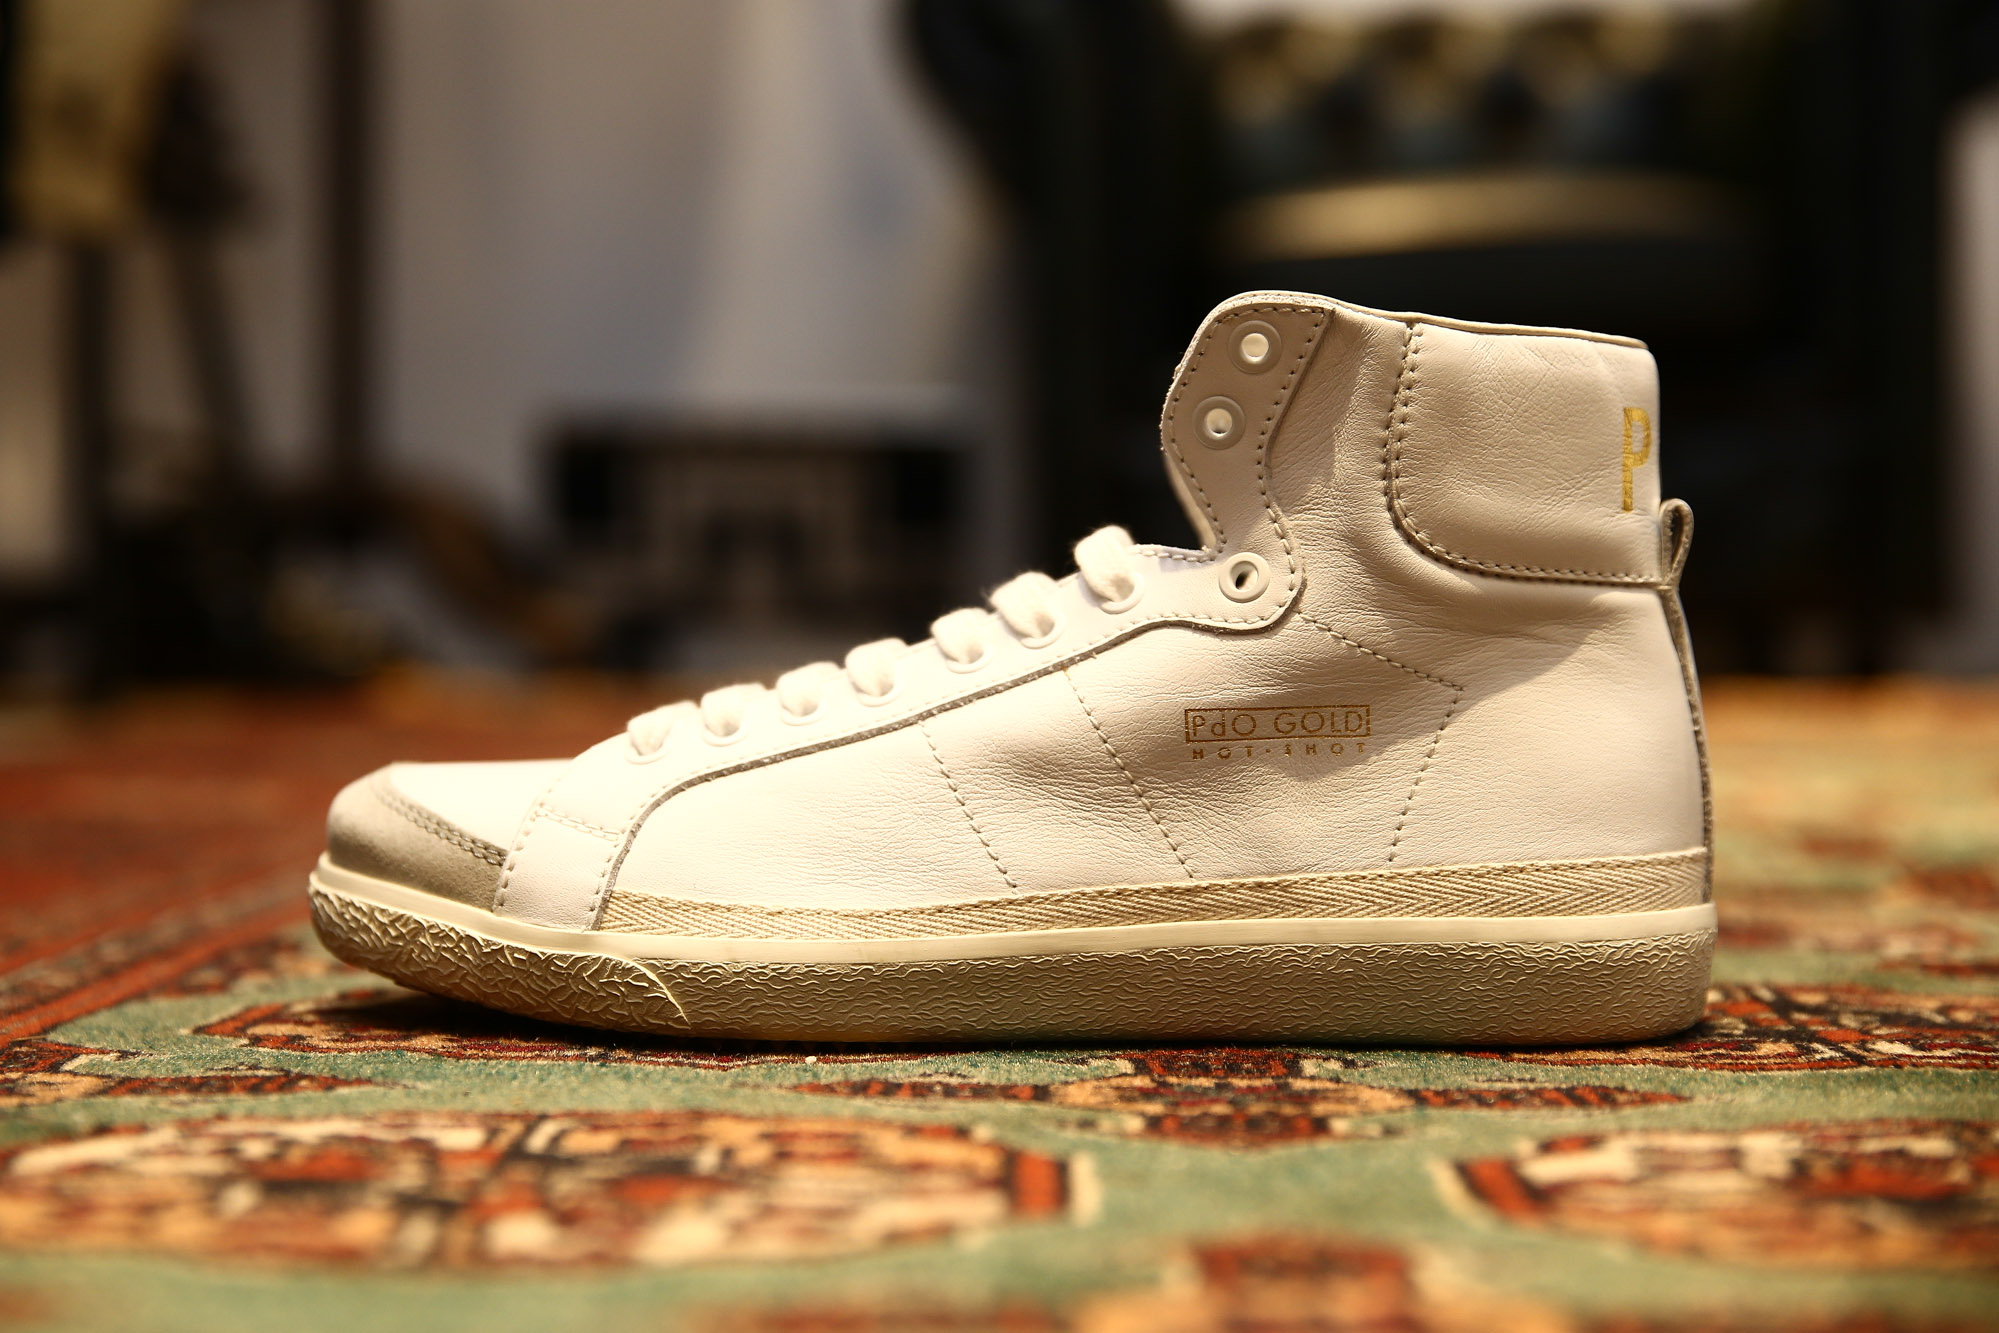 Pantofola d'Oro  パントフォラドーロ スニーカー PG75 WHITE ホワイト PG72 ホワイト/レッド ホワイト/グリーン 愛知 名古屋 ZODIAC ゾディアック 取扱い